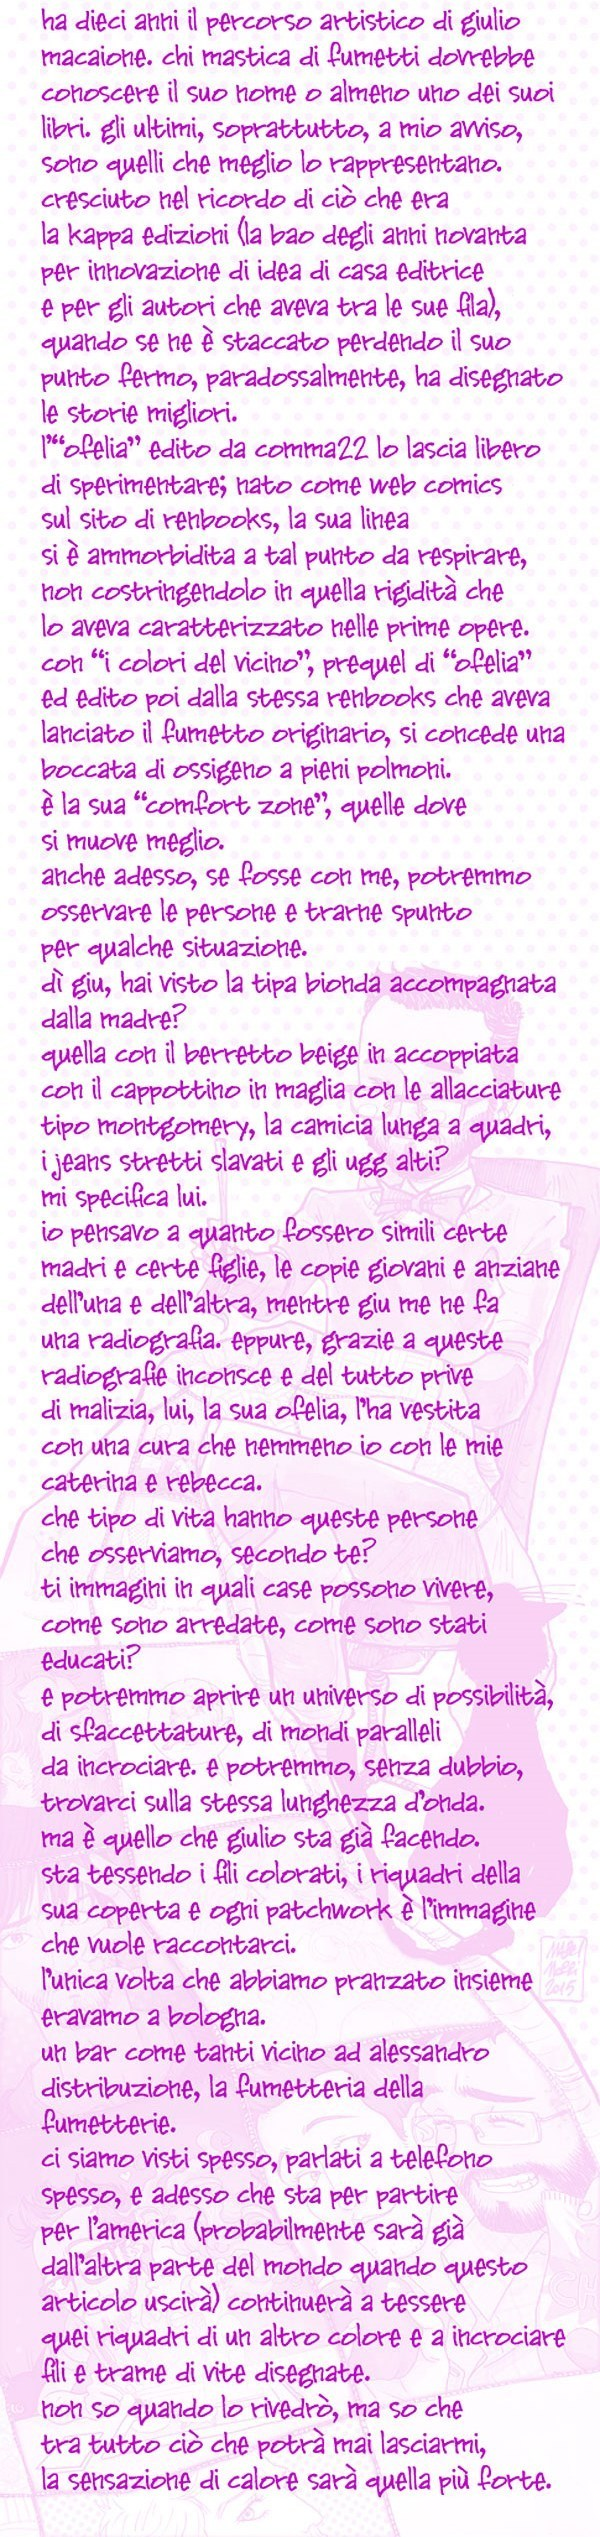 MabelMorriRacconta_GiulioMacaione3-600